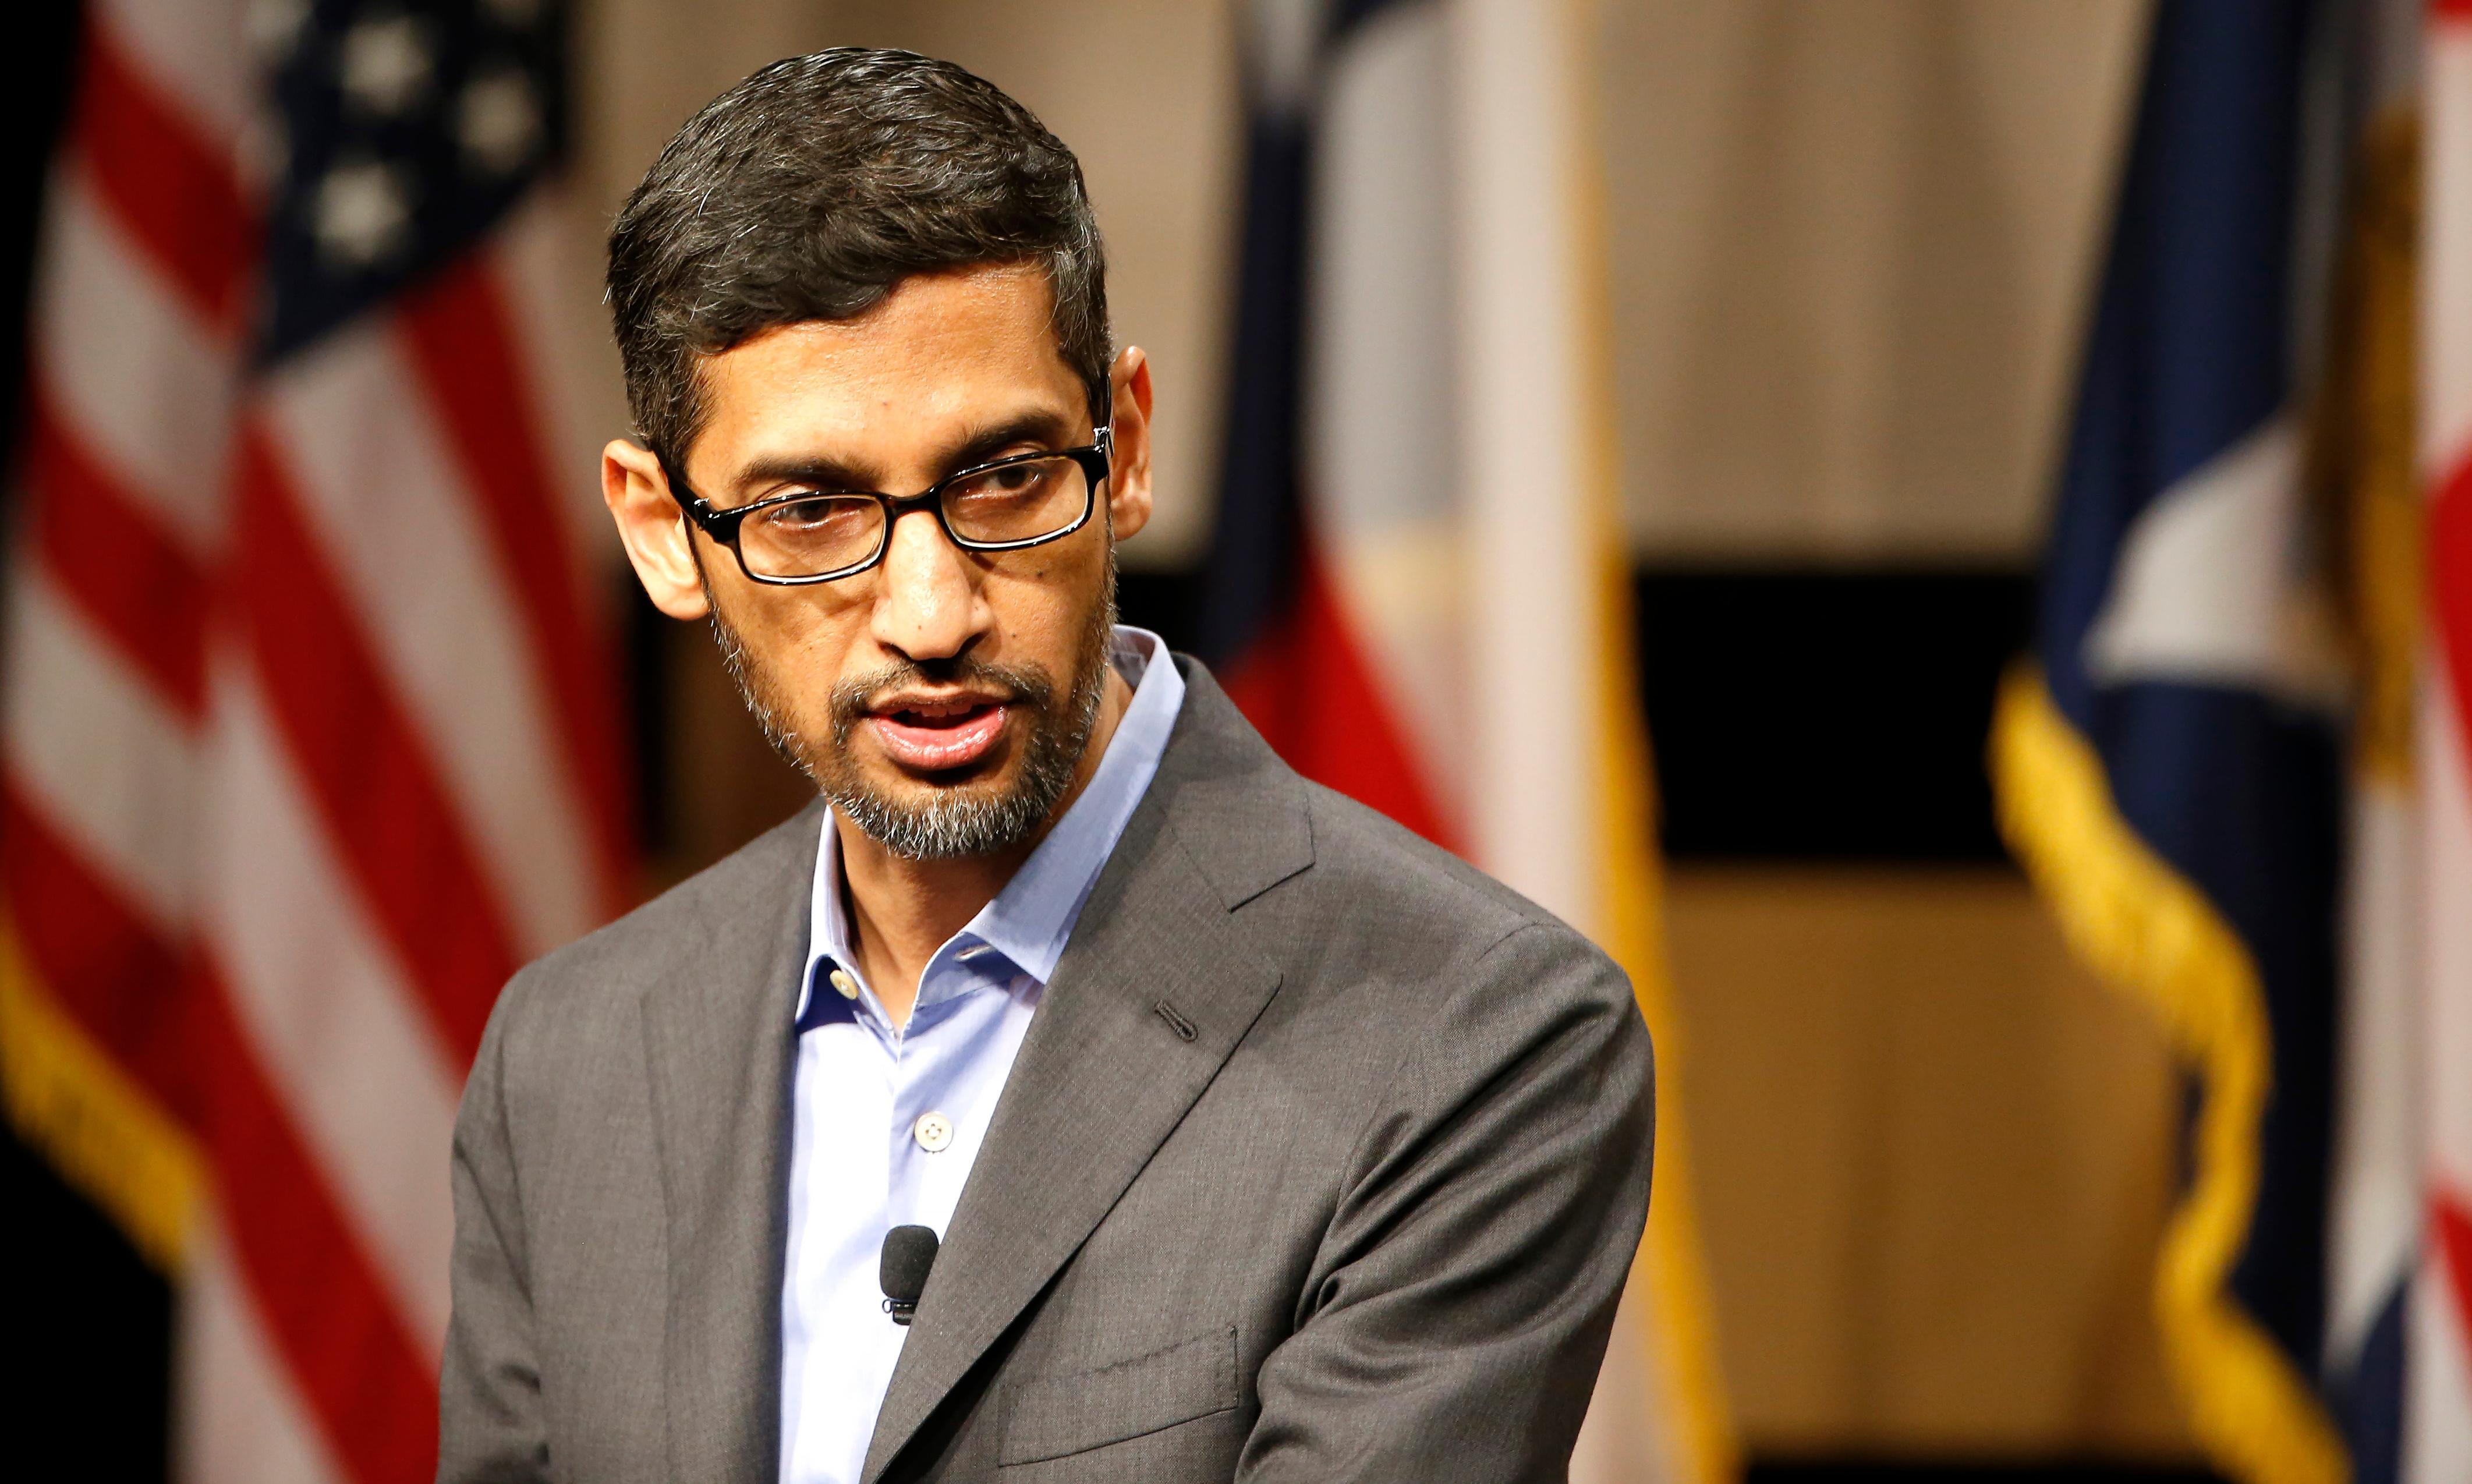 Democrat calls on Google to stop funding climate crisis deniers